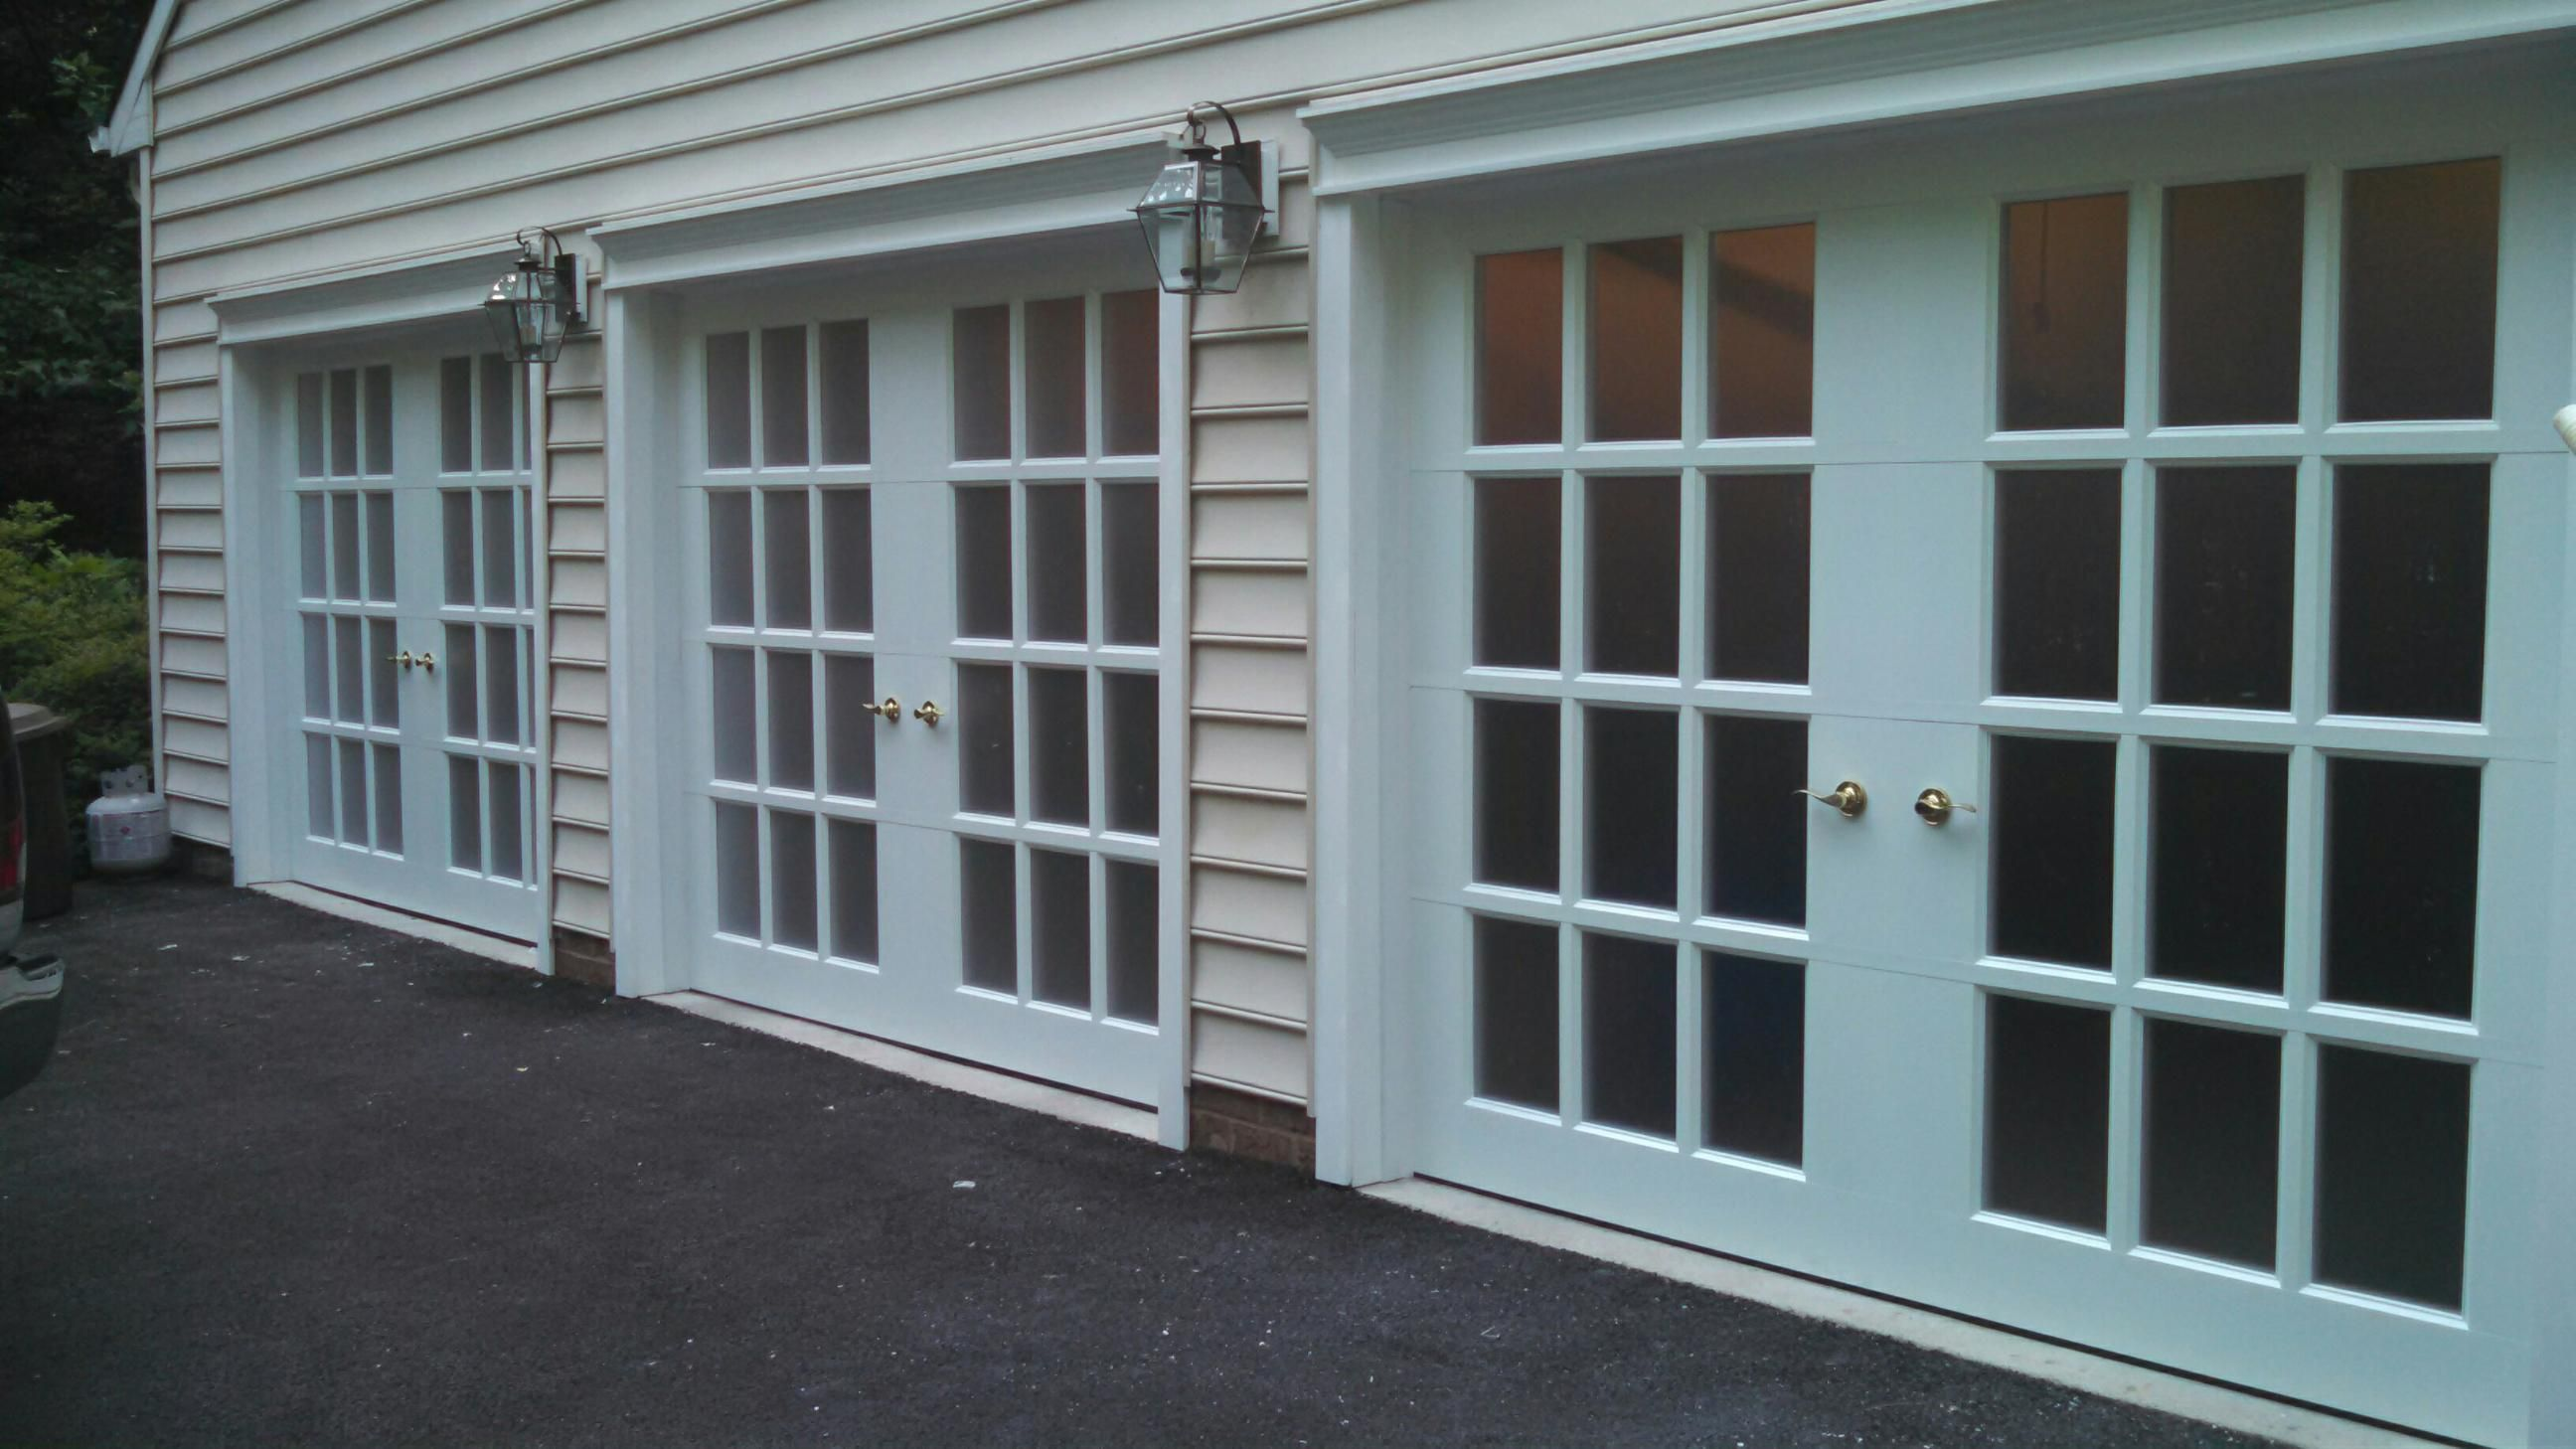 Three 8x7 Jennifer garage doors installed in Maryland. & Three 8x7 Jennifer garage doors installed in Maryland. | Gararge ... pezcame.com